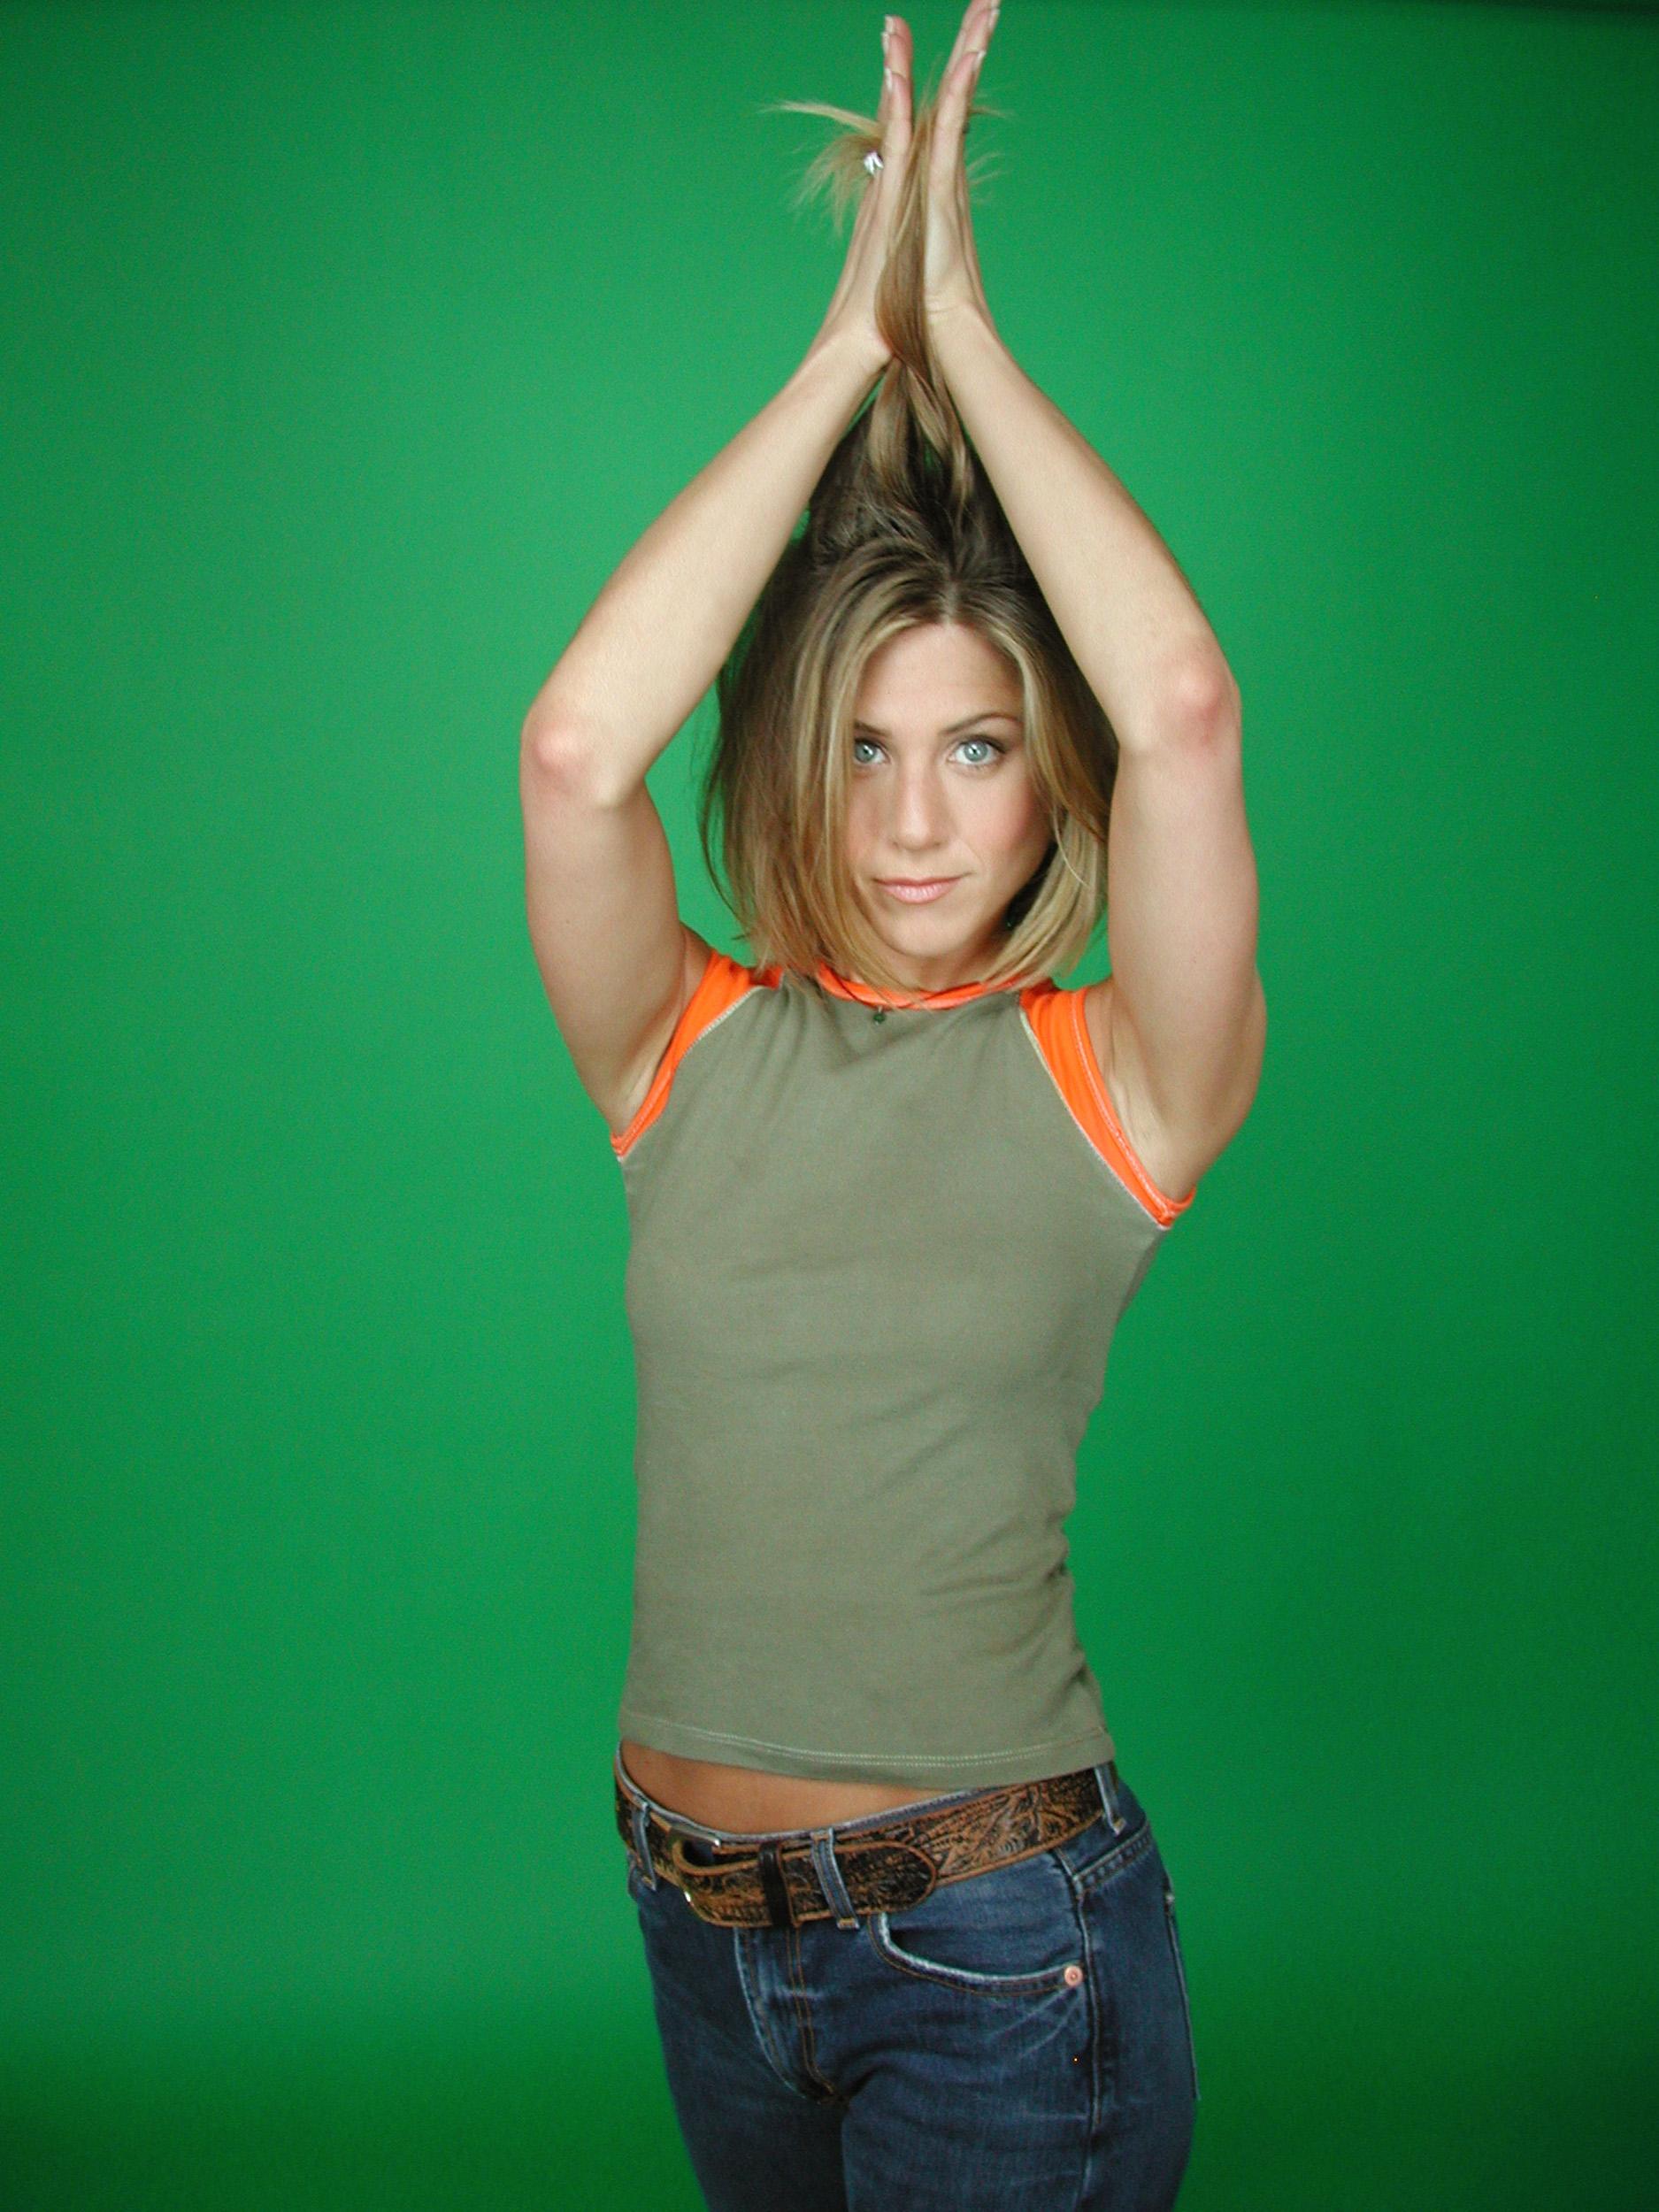 Jennifer Aniston photo 76 of 1818 pics, wallpaper - photo